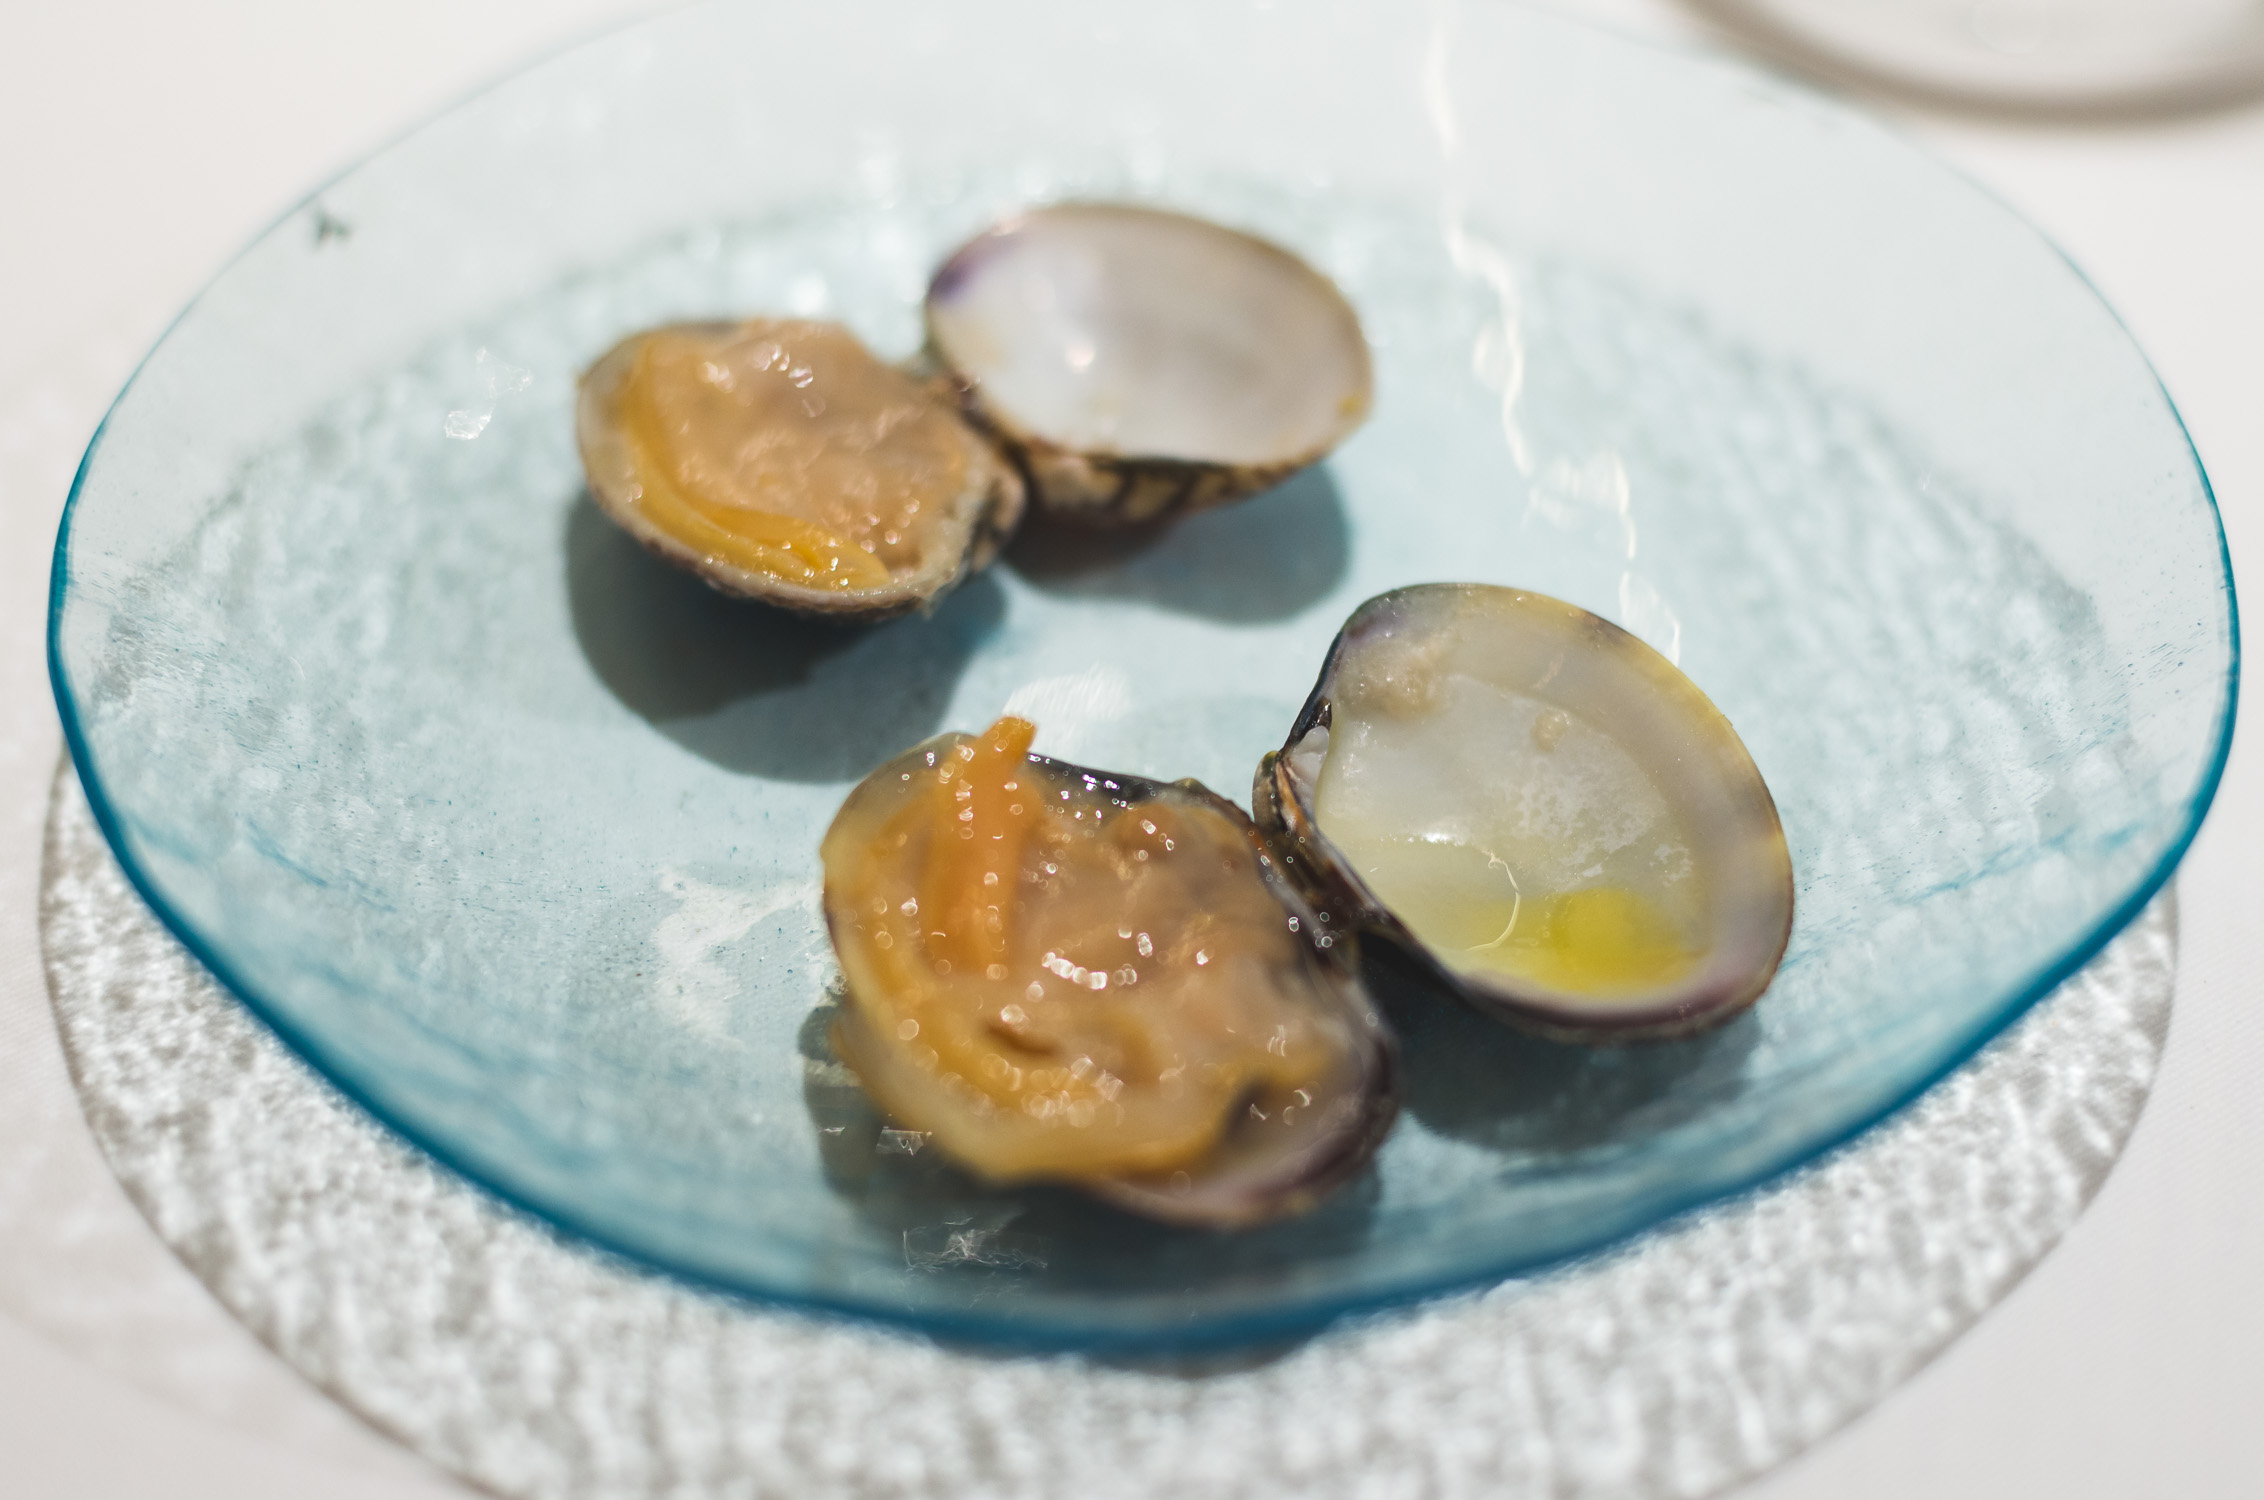 Clam glazed with lemon